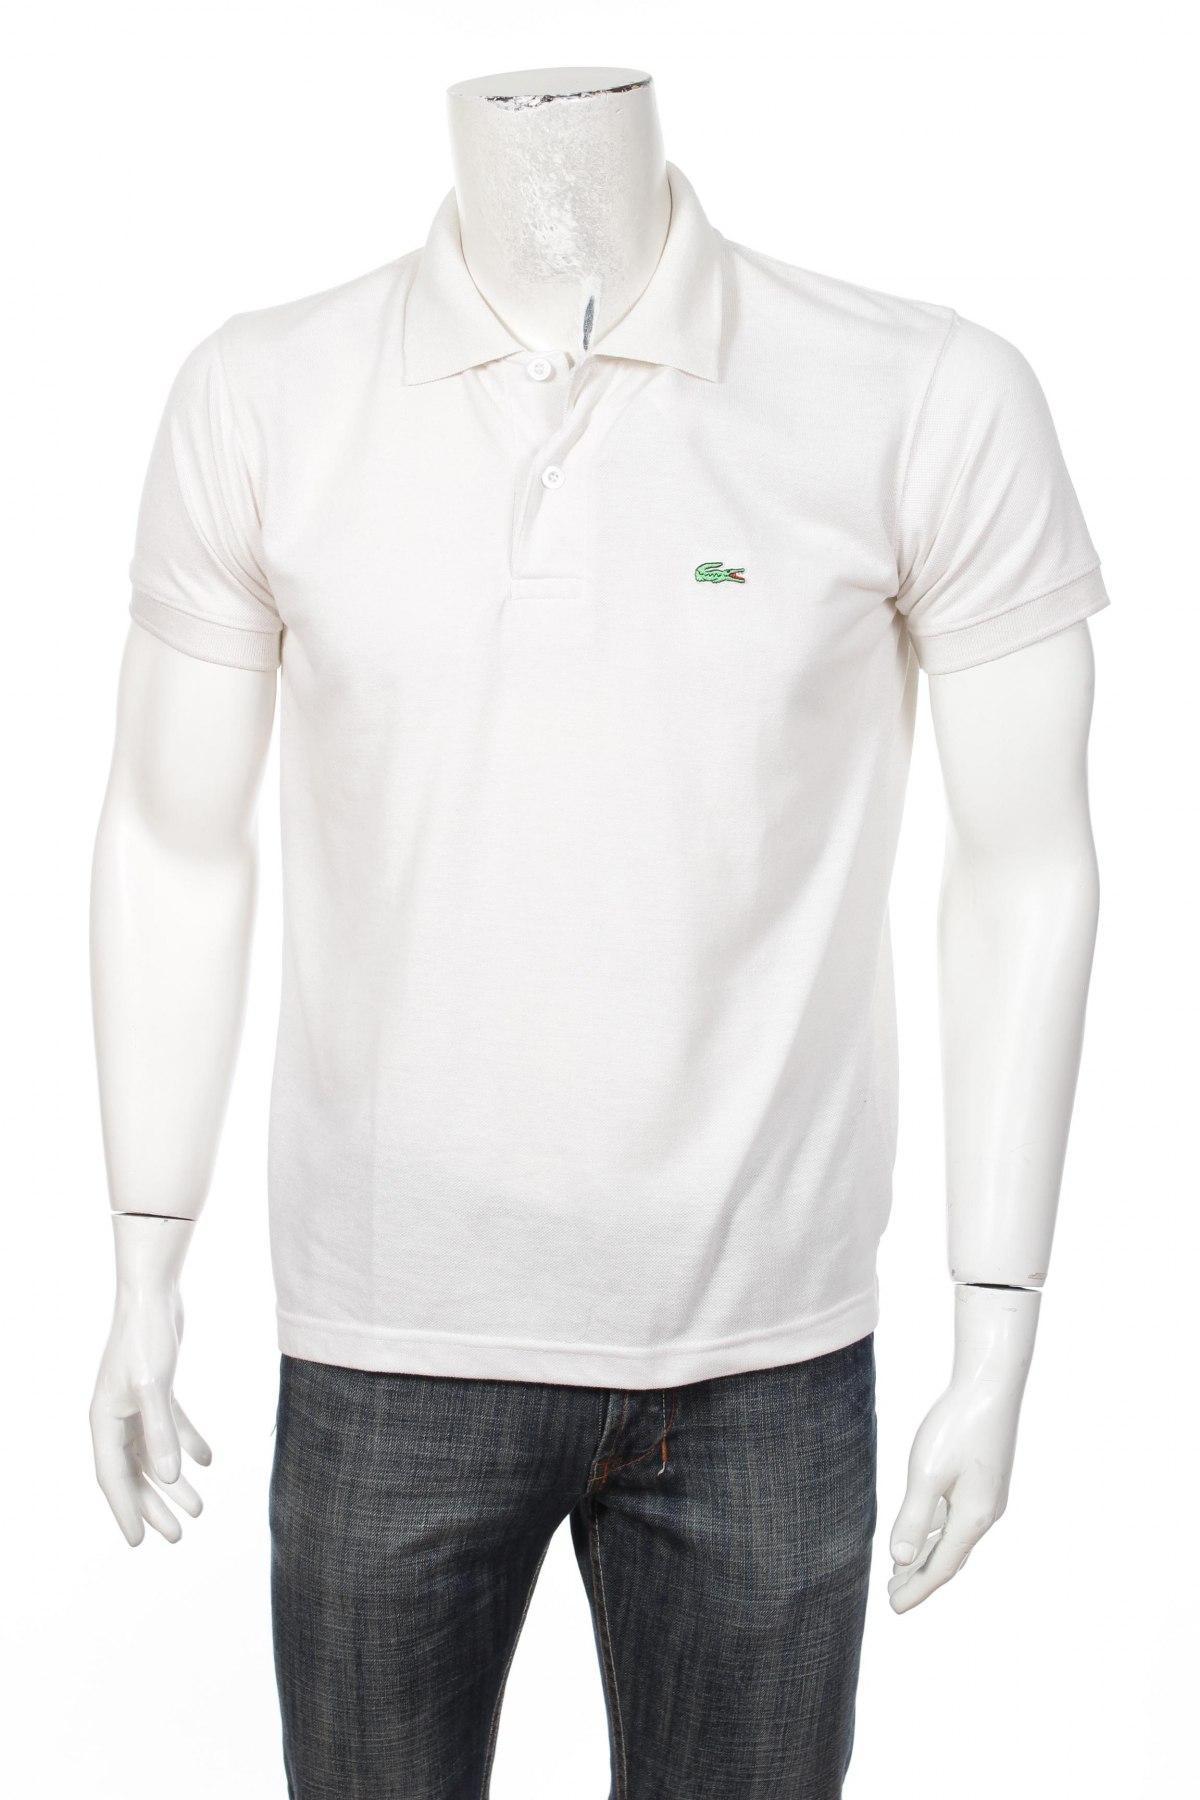 8083bbf4dee6 Ανδρικό t-shirt Lacoste - σε συμφέρουσα τιμή στο Remix -  8414818